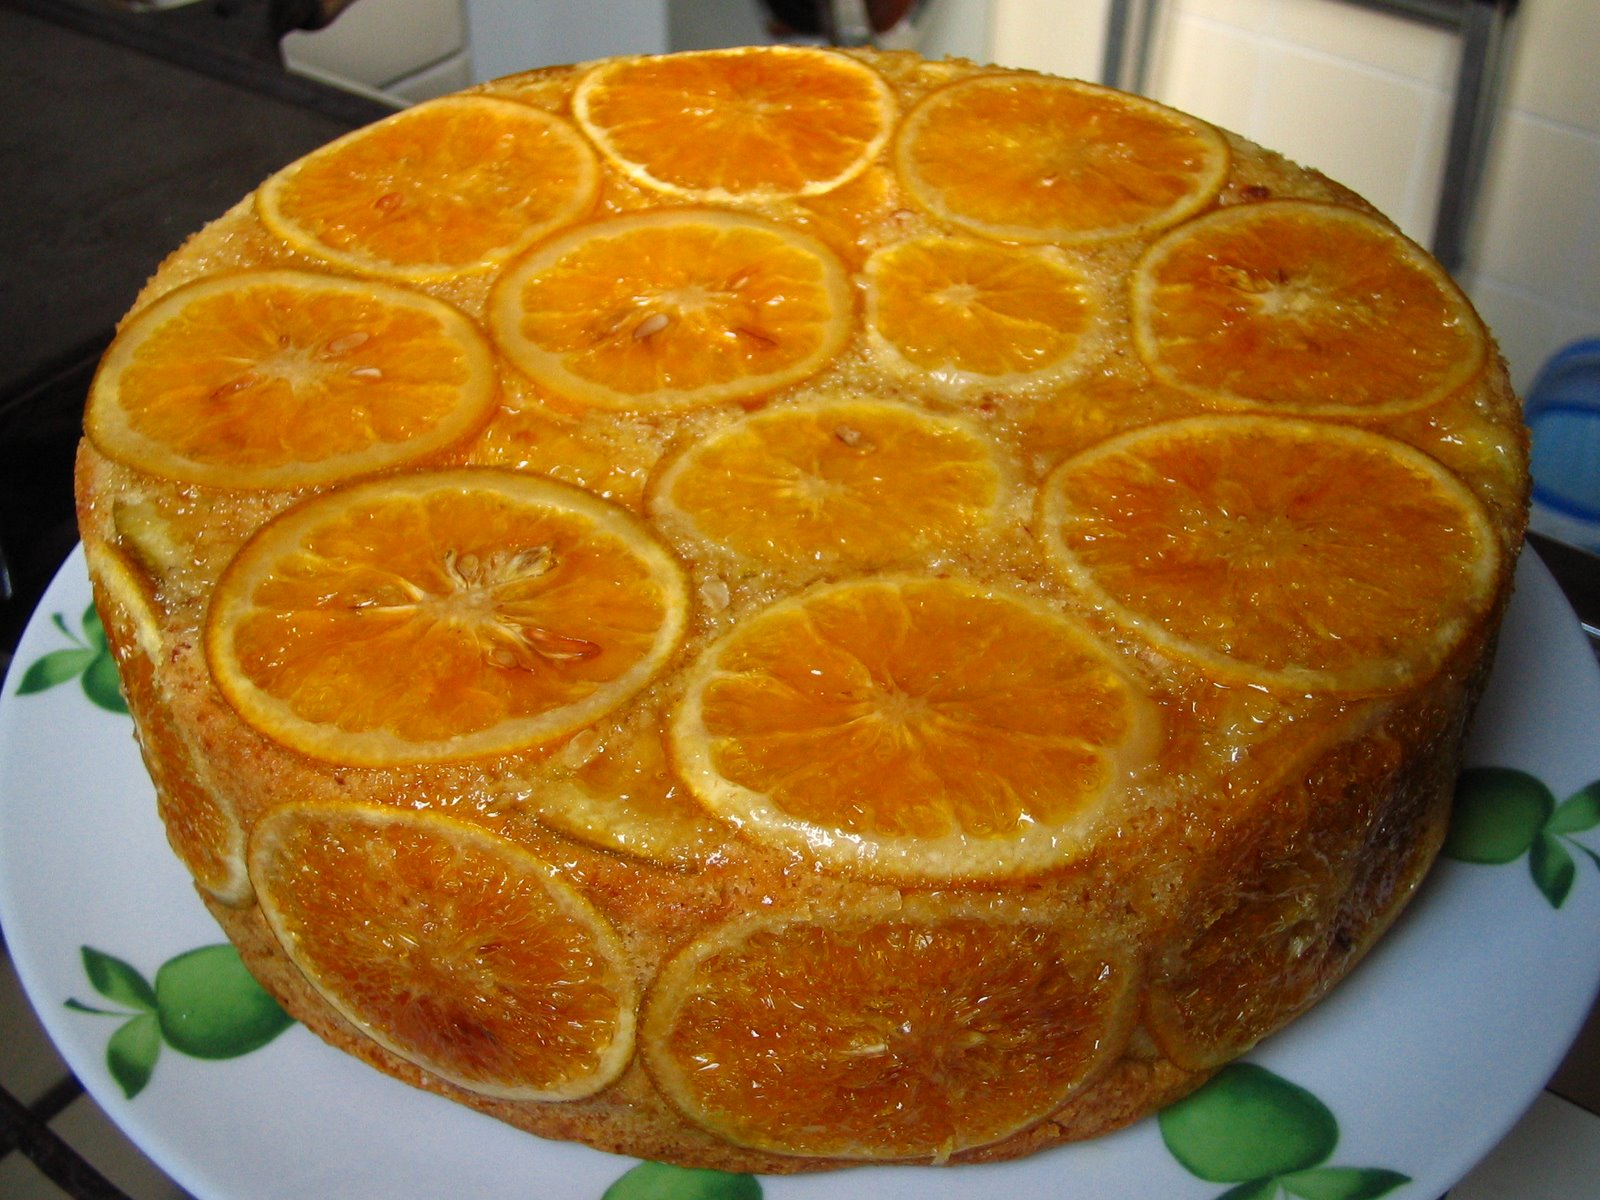 Vaqueiro - Torta de laranja e coco